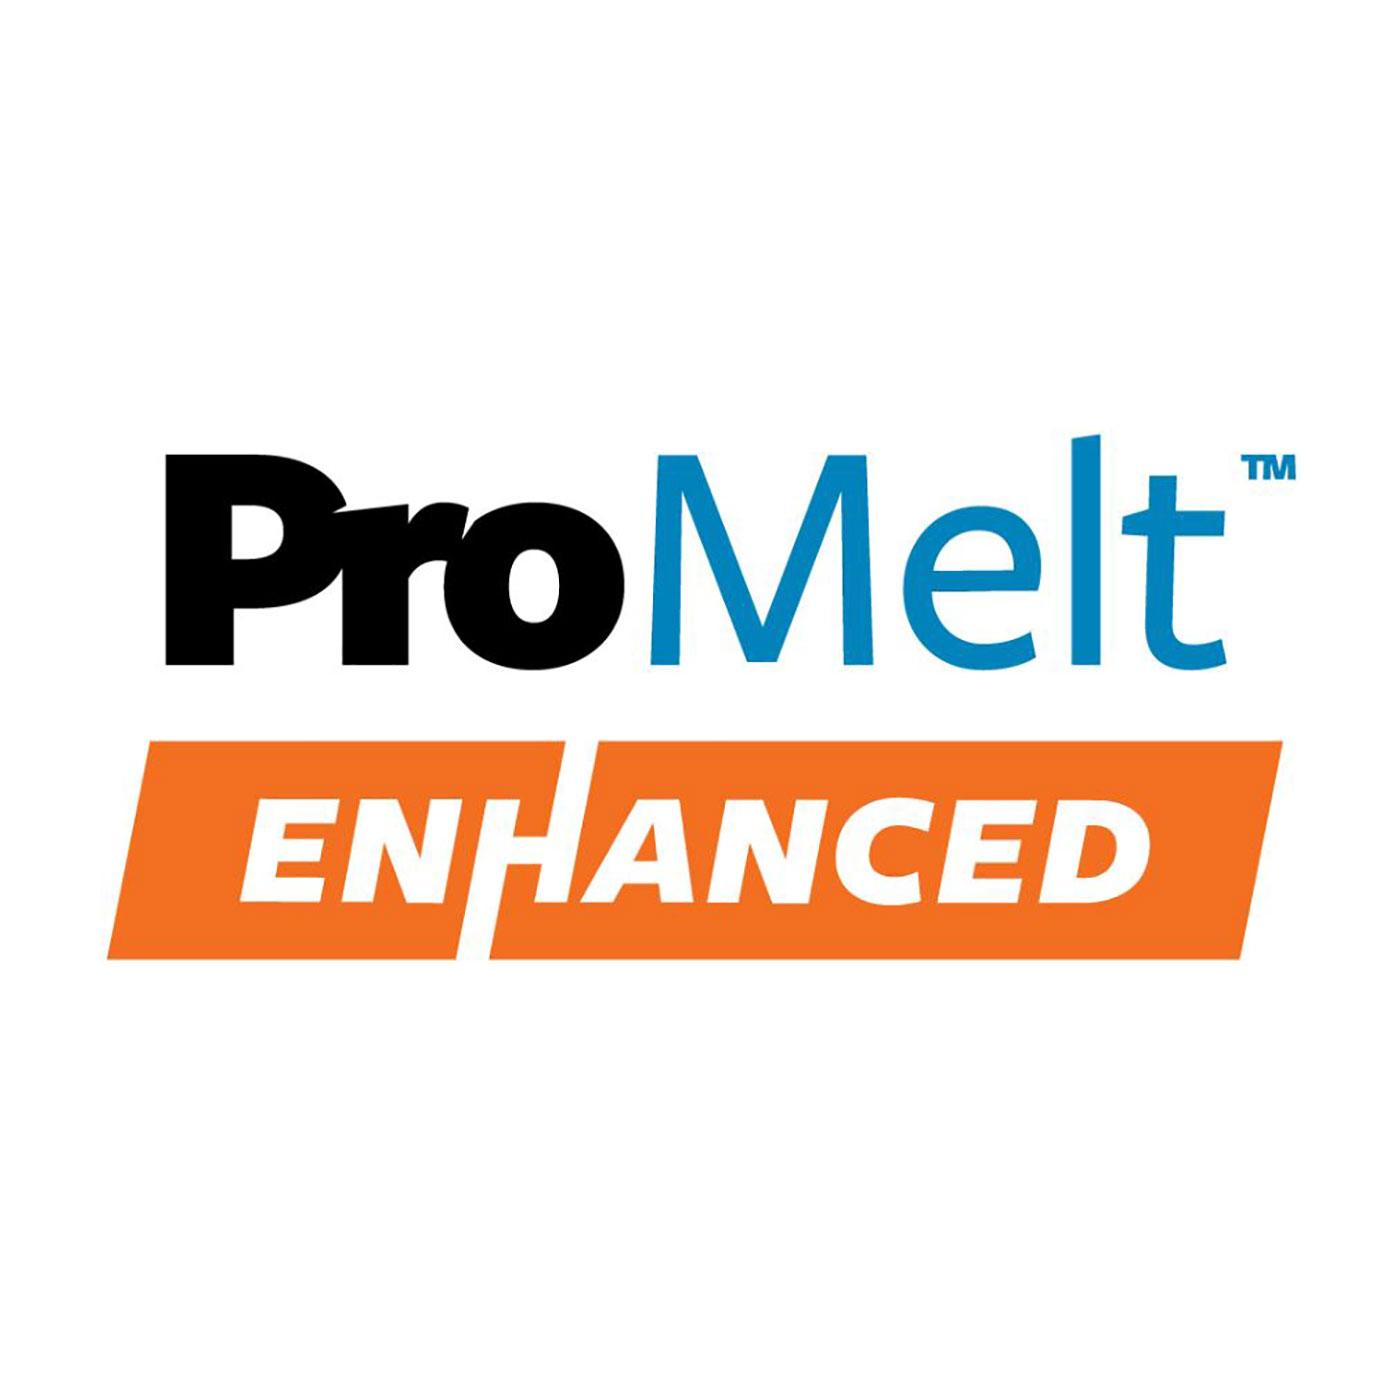 Promelt Slicer Enhanced (20 kg)